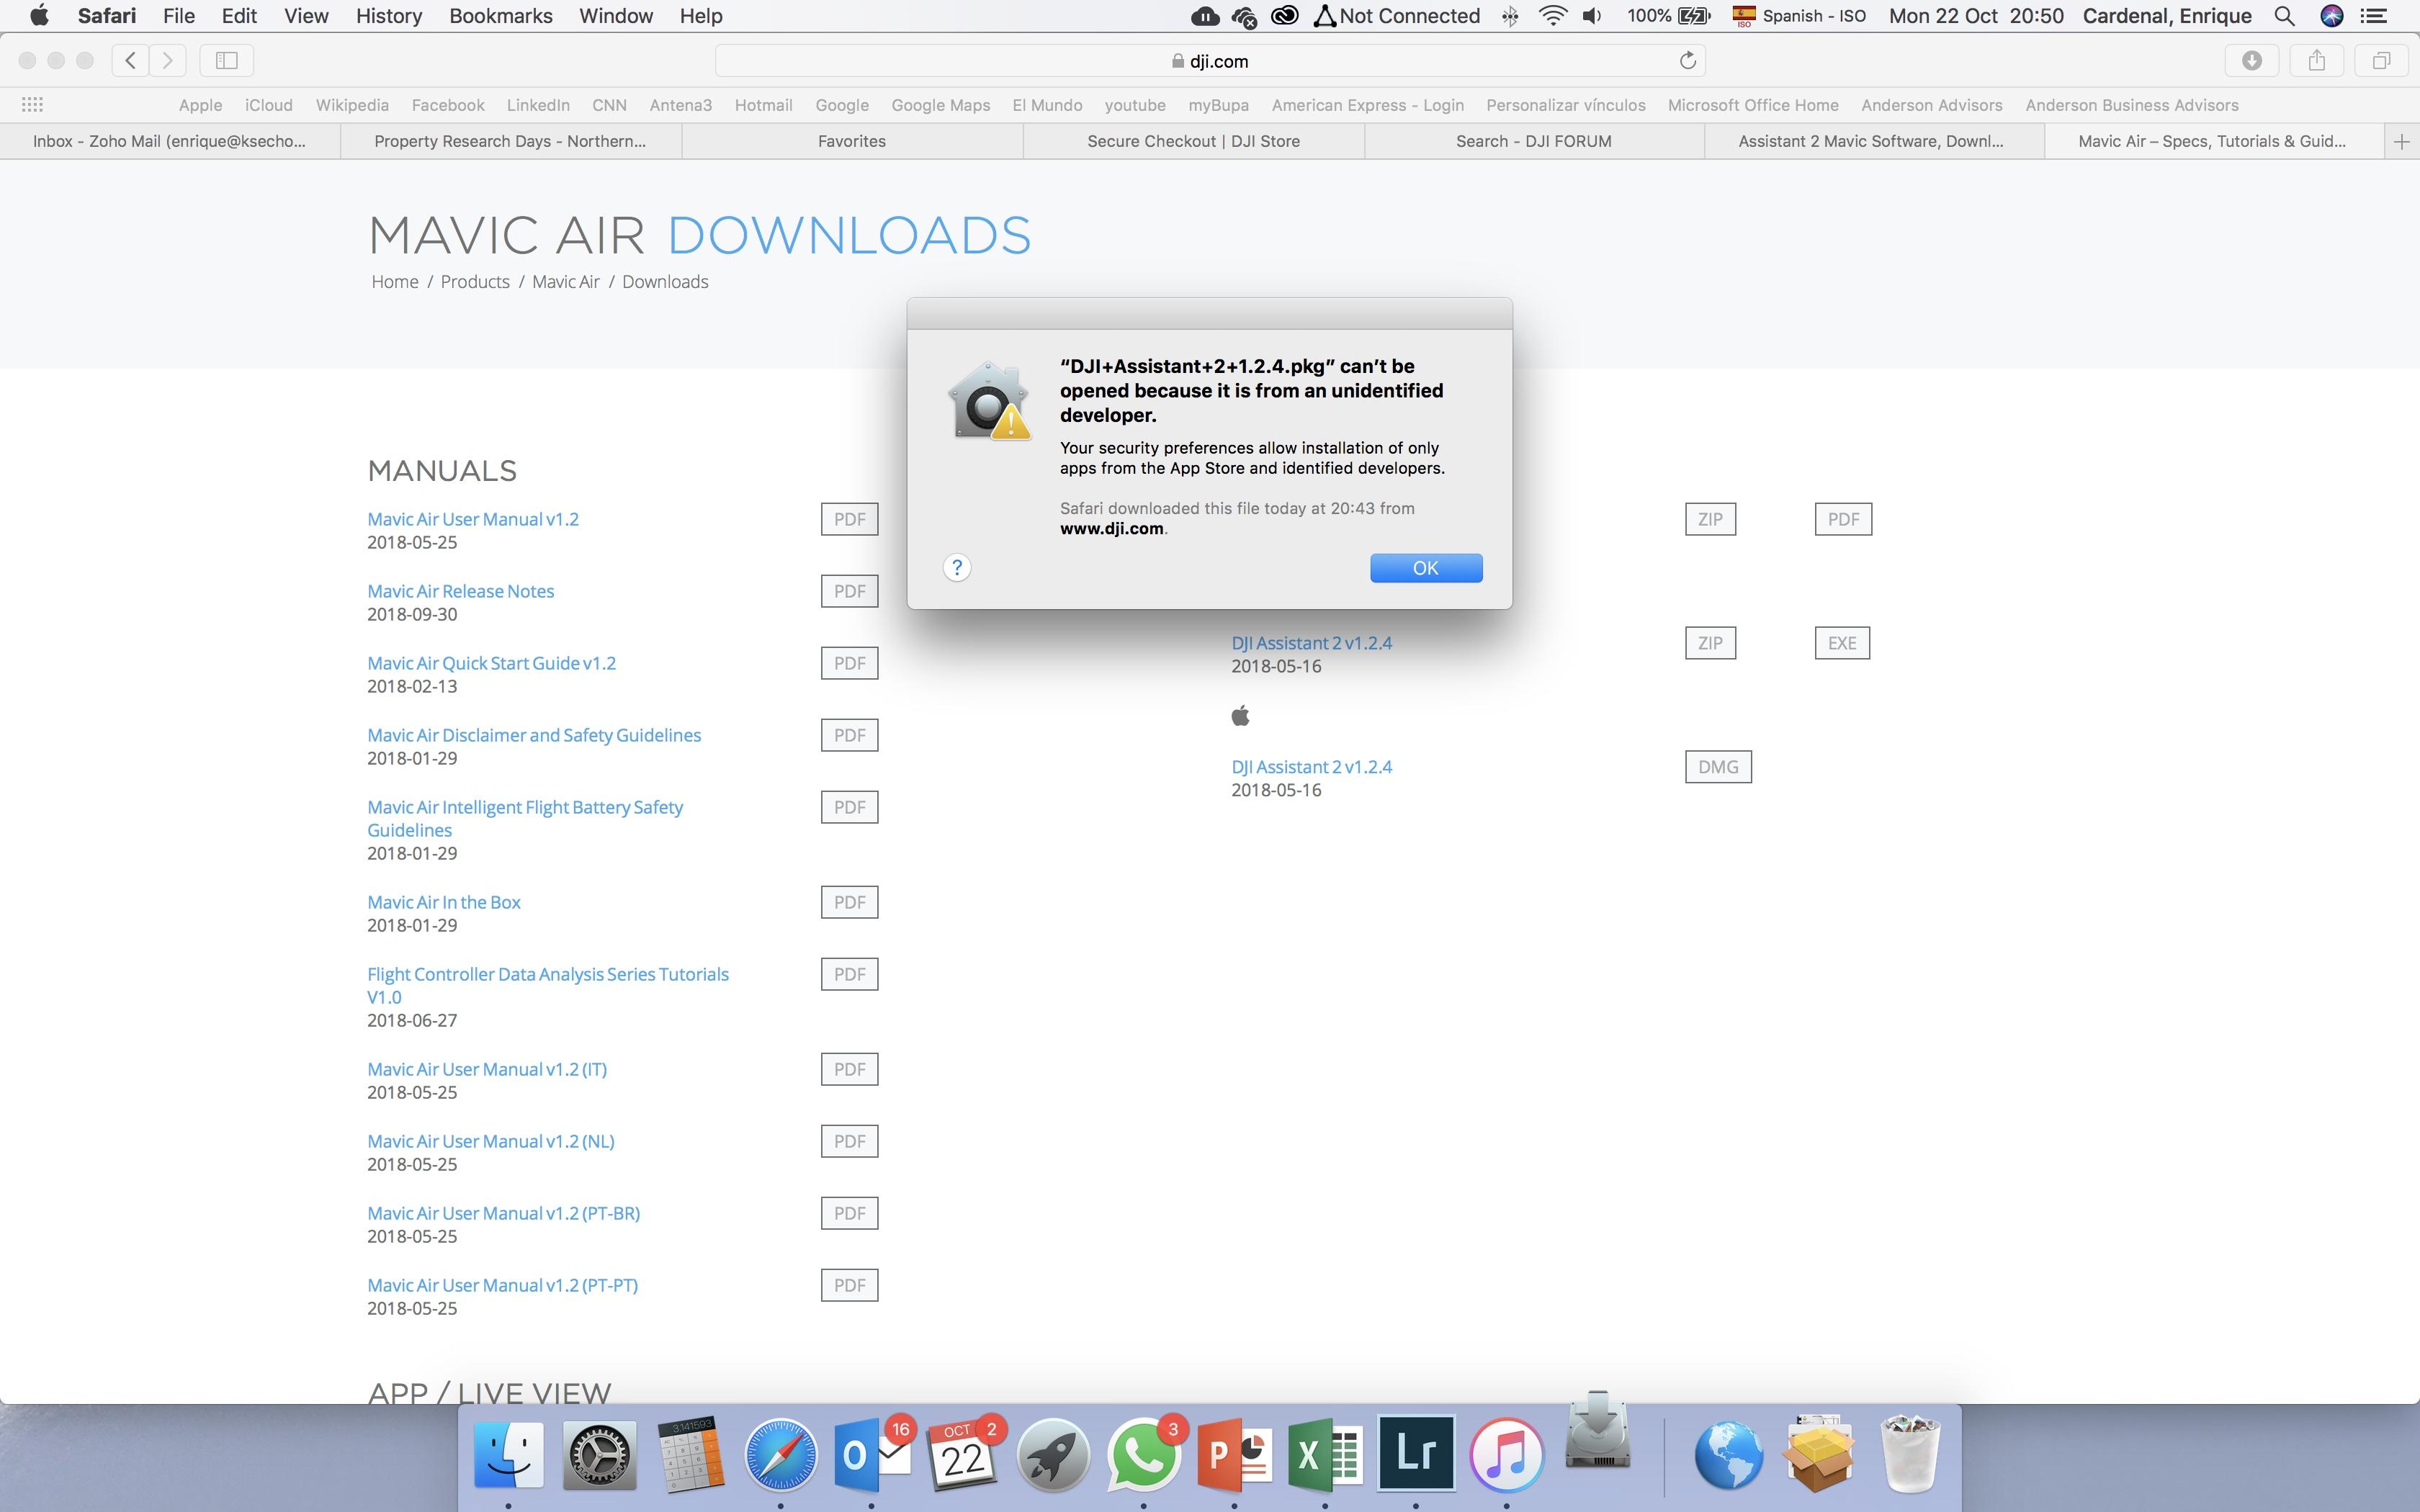 DJI Assistant 2 Mavic software incompatibility??? | DJI FORUM